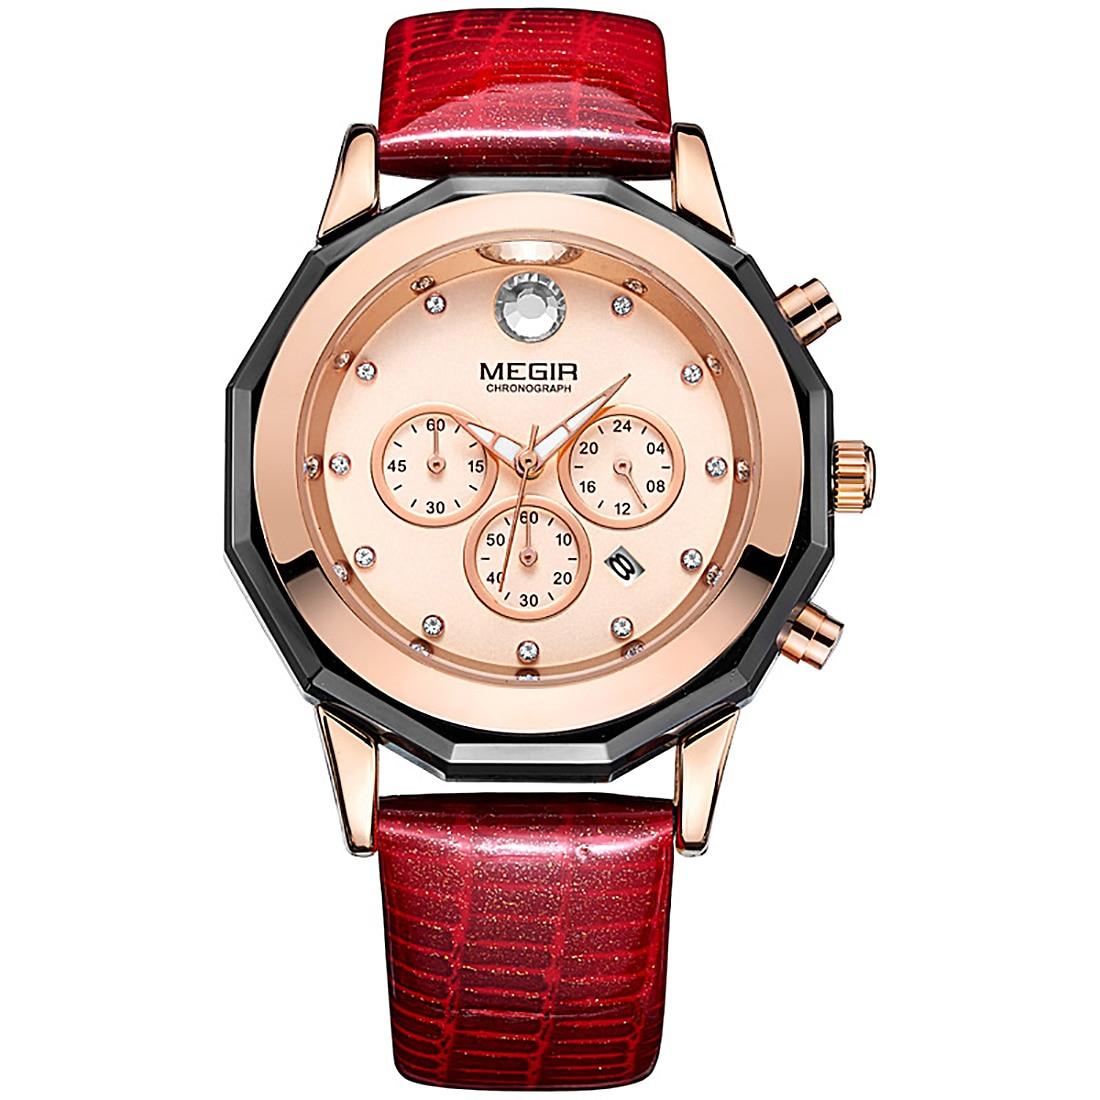 women-quartz-wristwatch-genuine-leather-three-eyes-analog-business-formal-watches-fashion-dress-font-b-rosefield-b-font-clock-party-2018-new